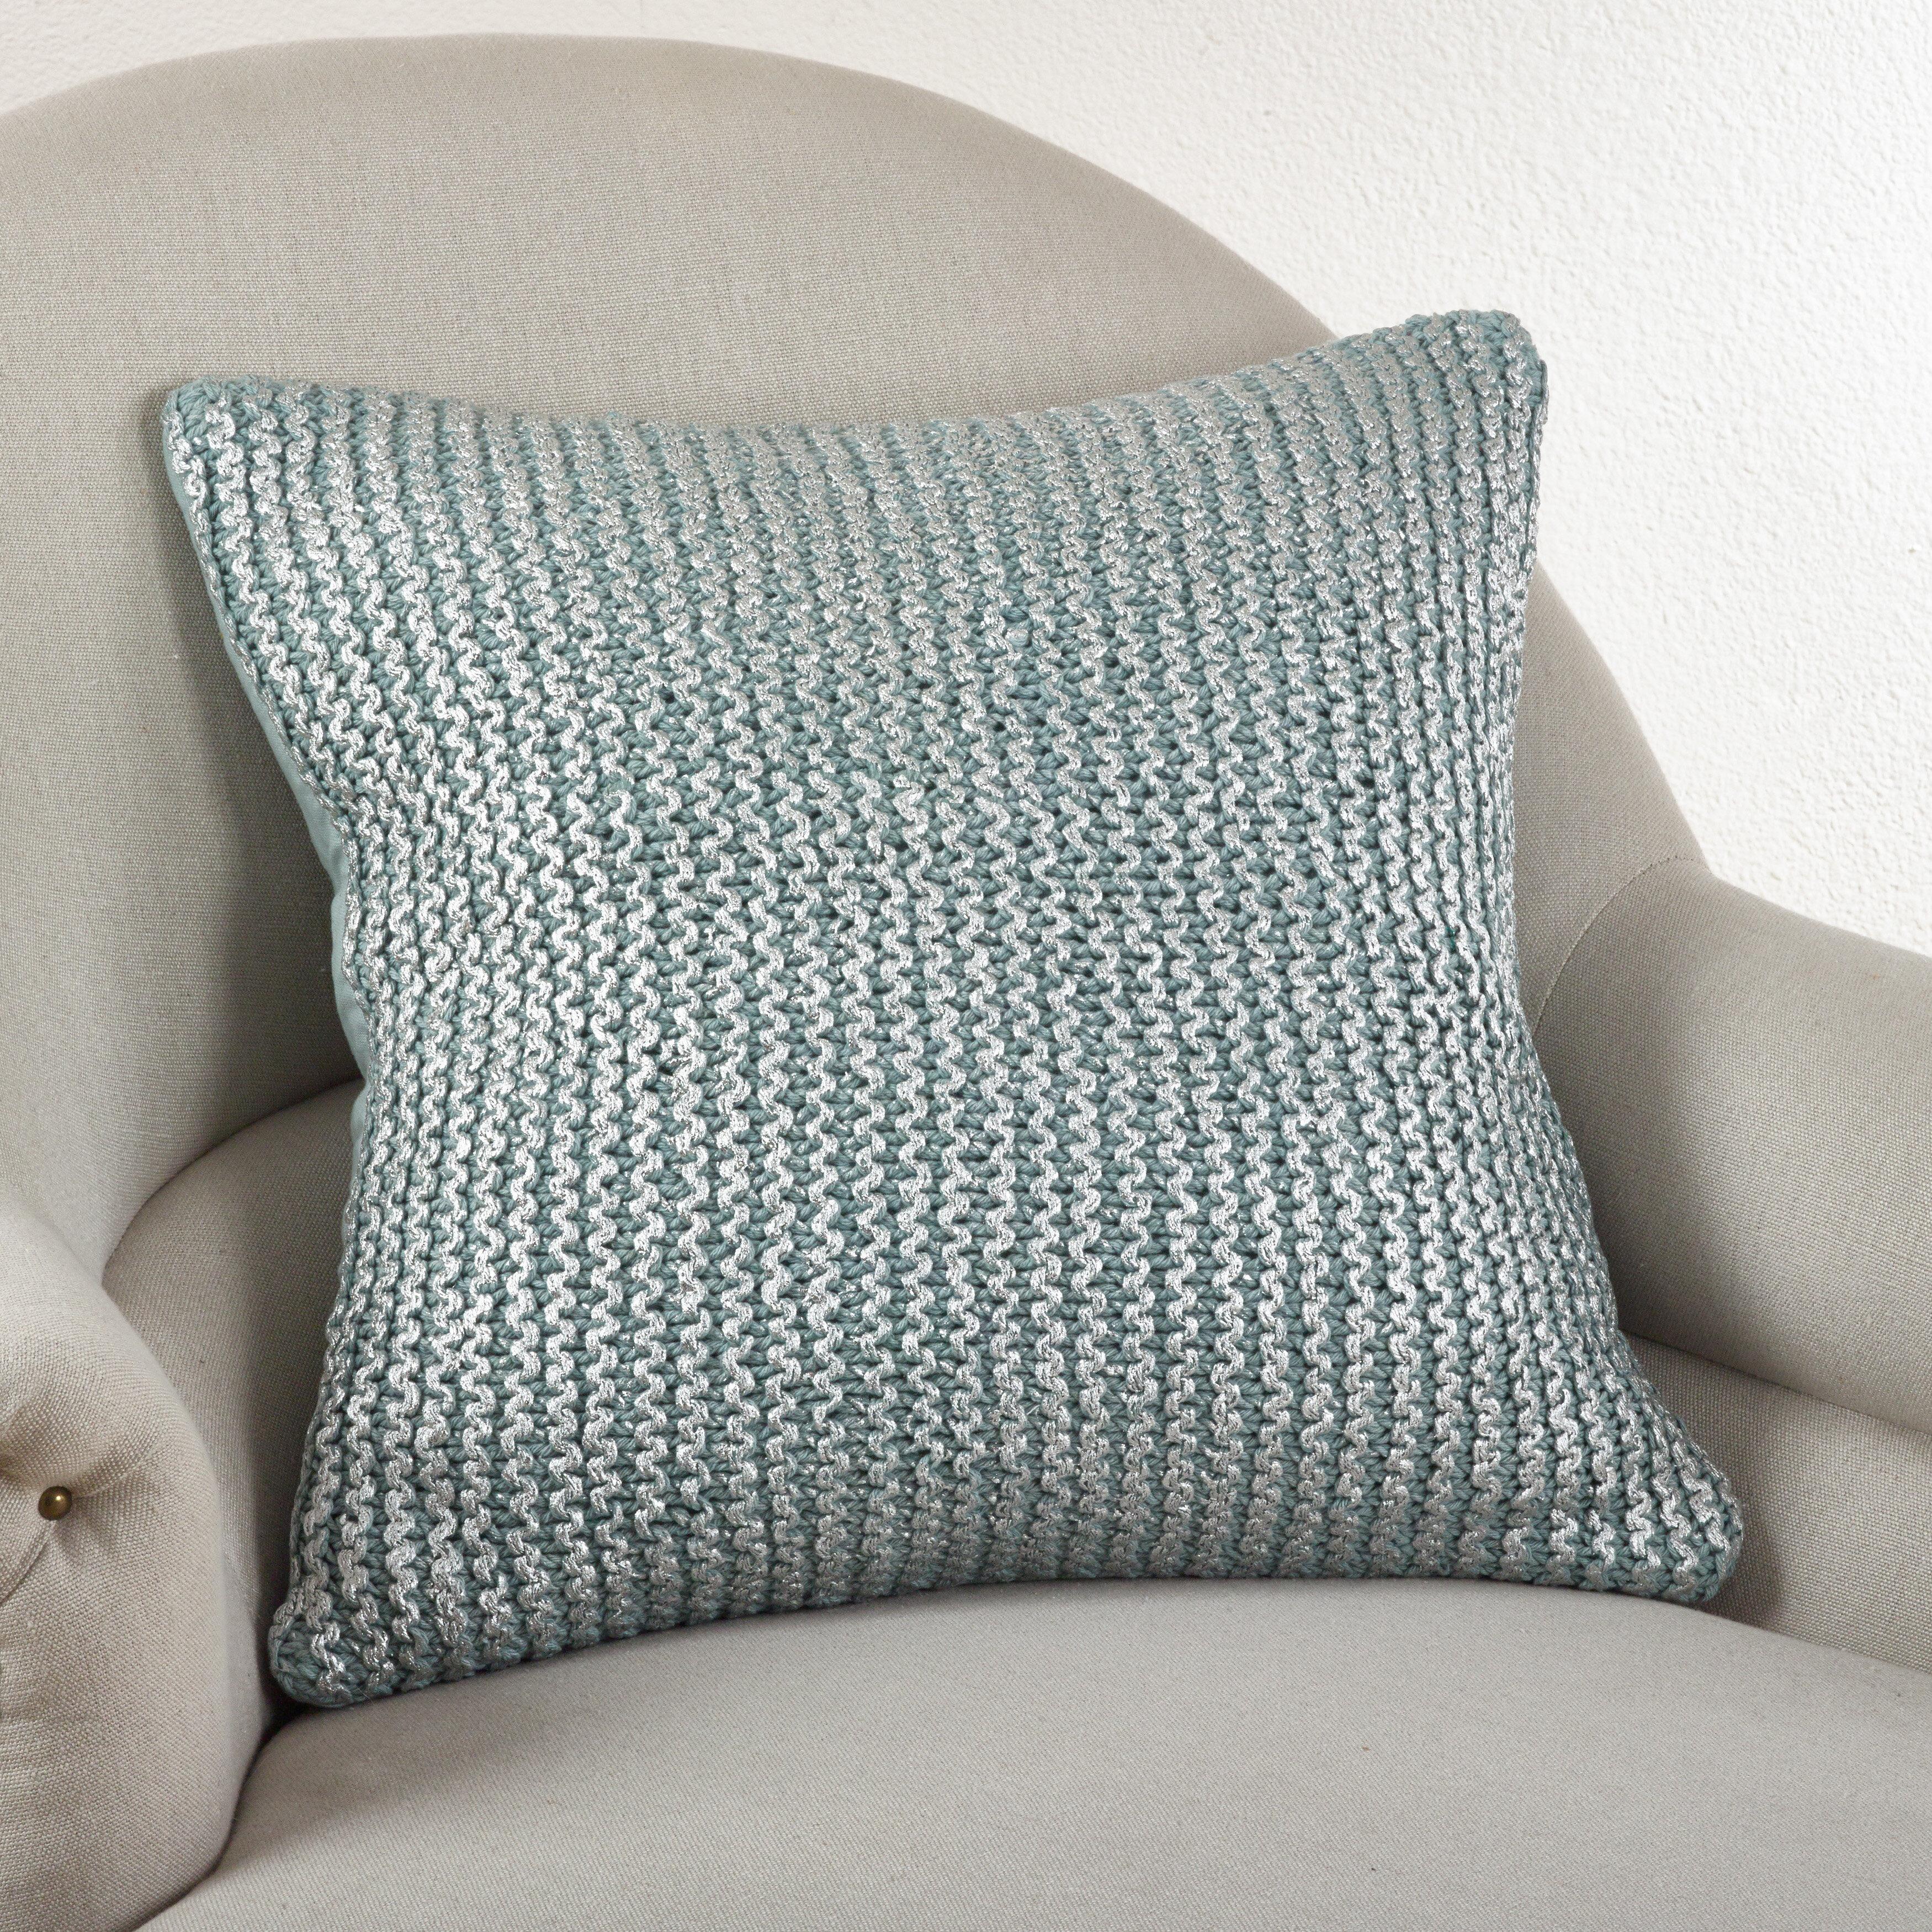 Willa Arlo Interiors Hiran Cotton Throw Pillow & Reviews | Wayfair